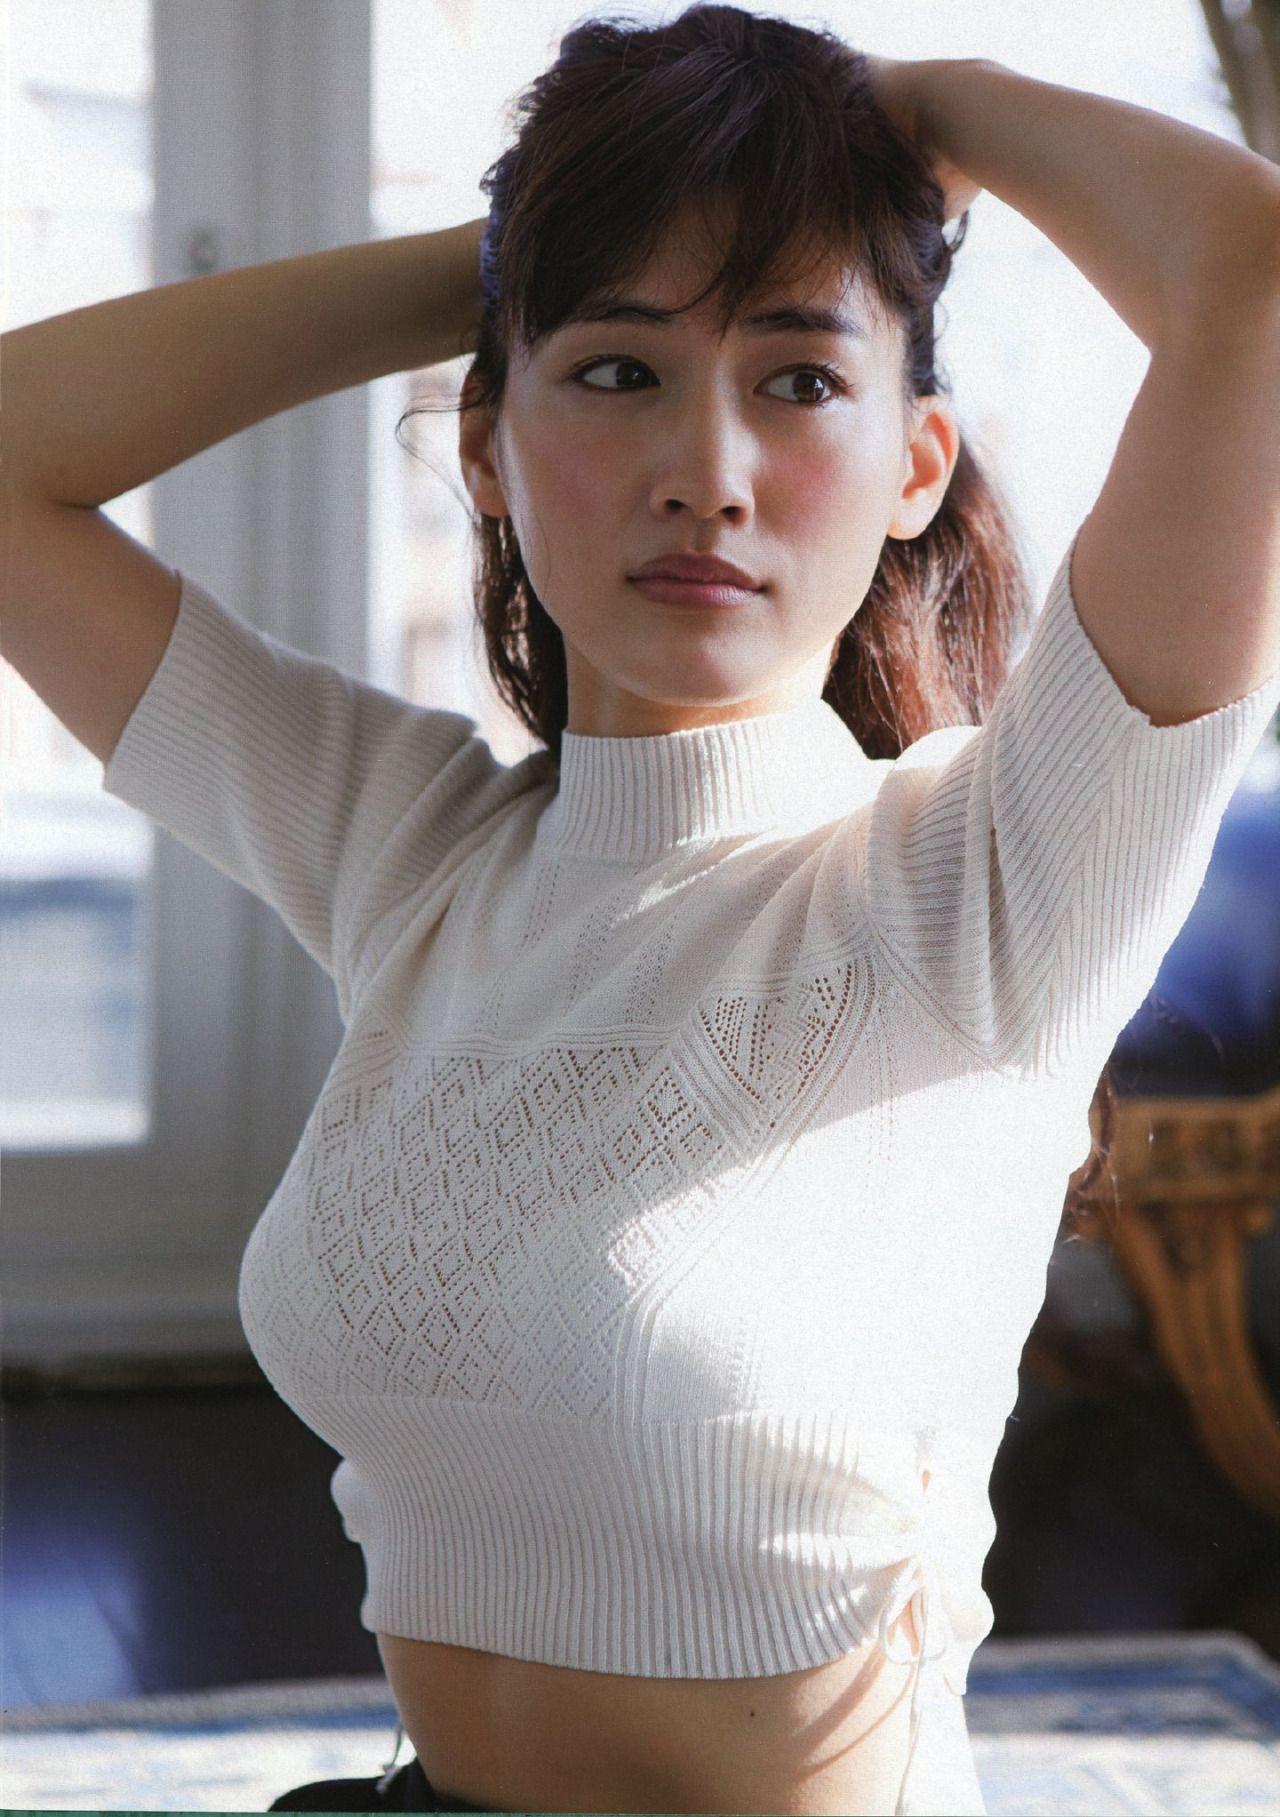 Pin by Bagus Gede Ananta Kusuma Sutarga on B.E.A.U.T.I.F.I.E.D | Pinterest | Asian ...